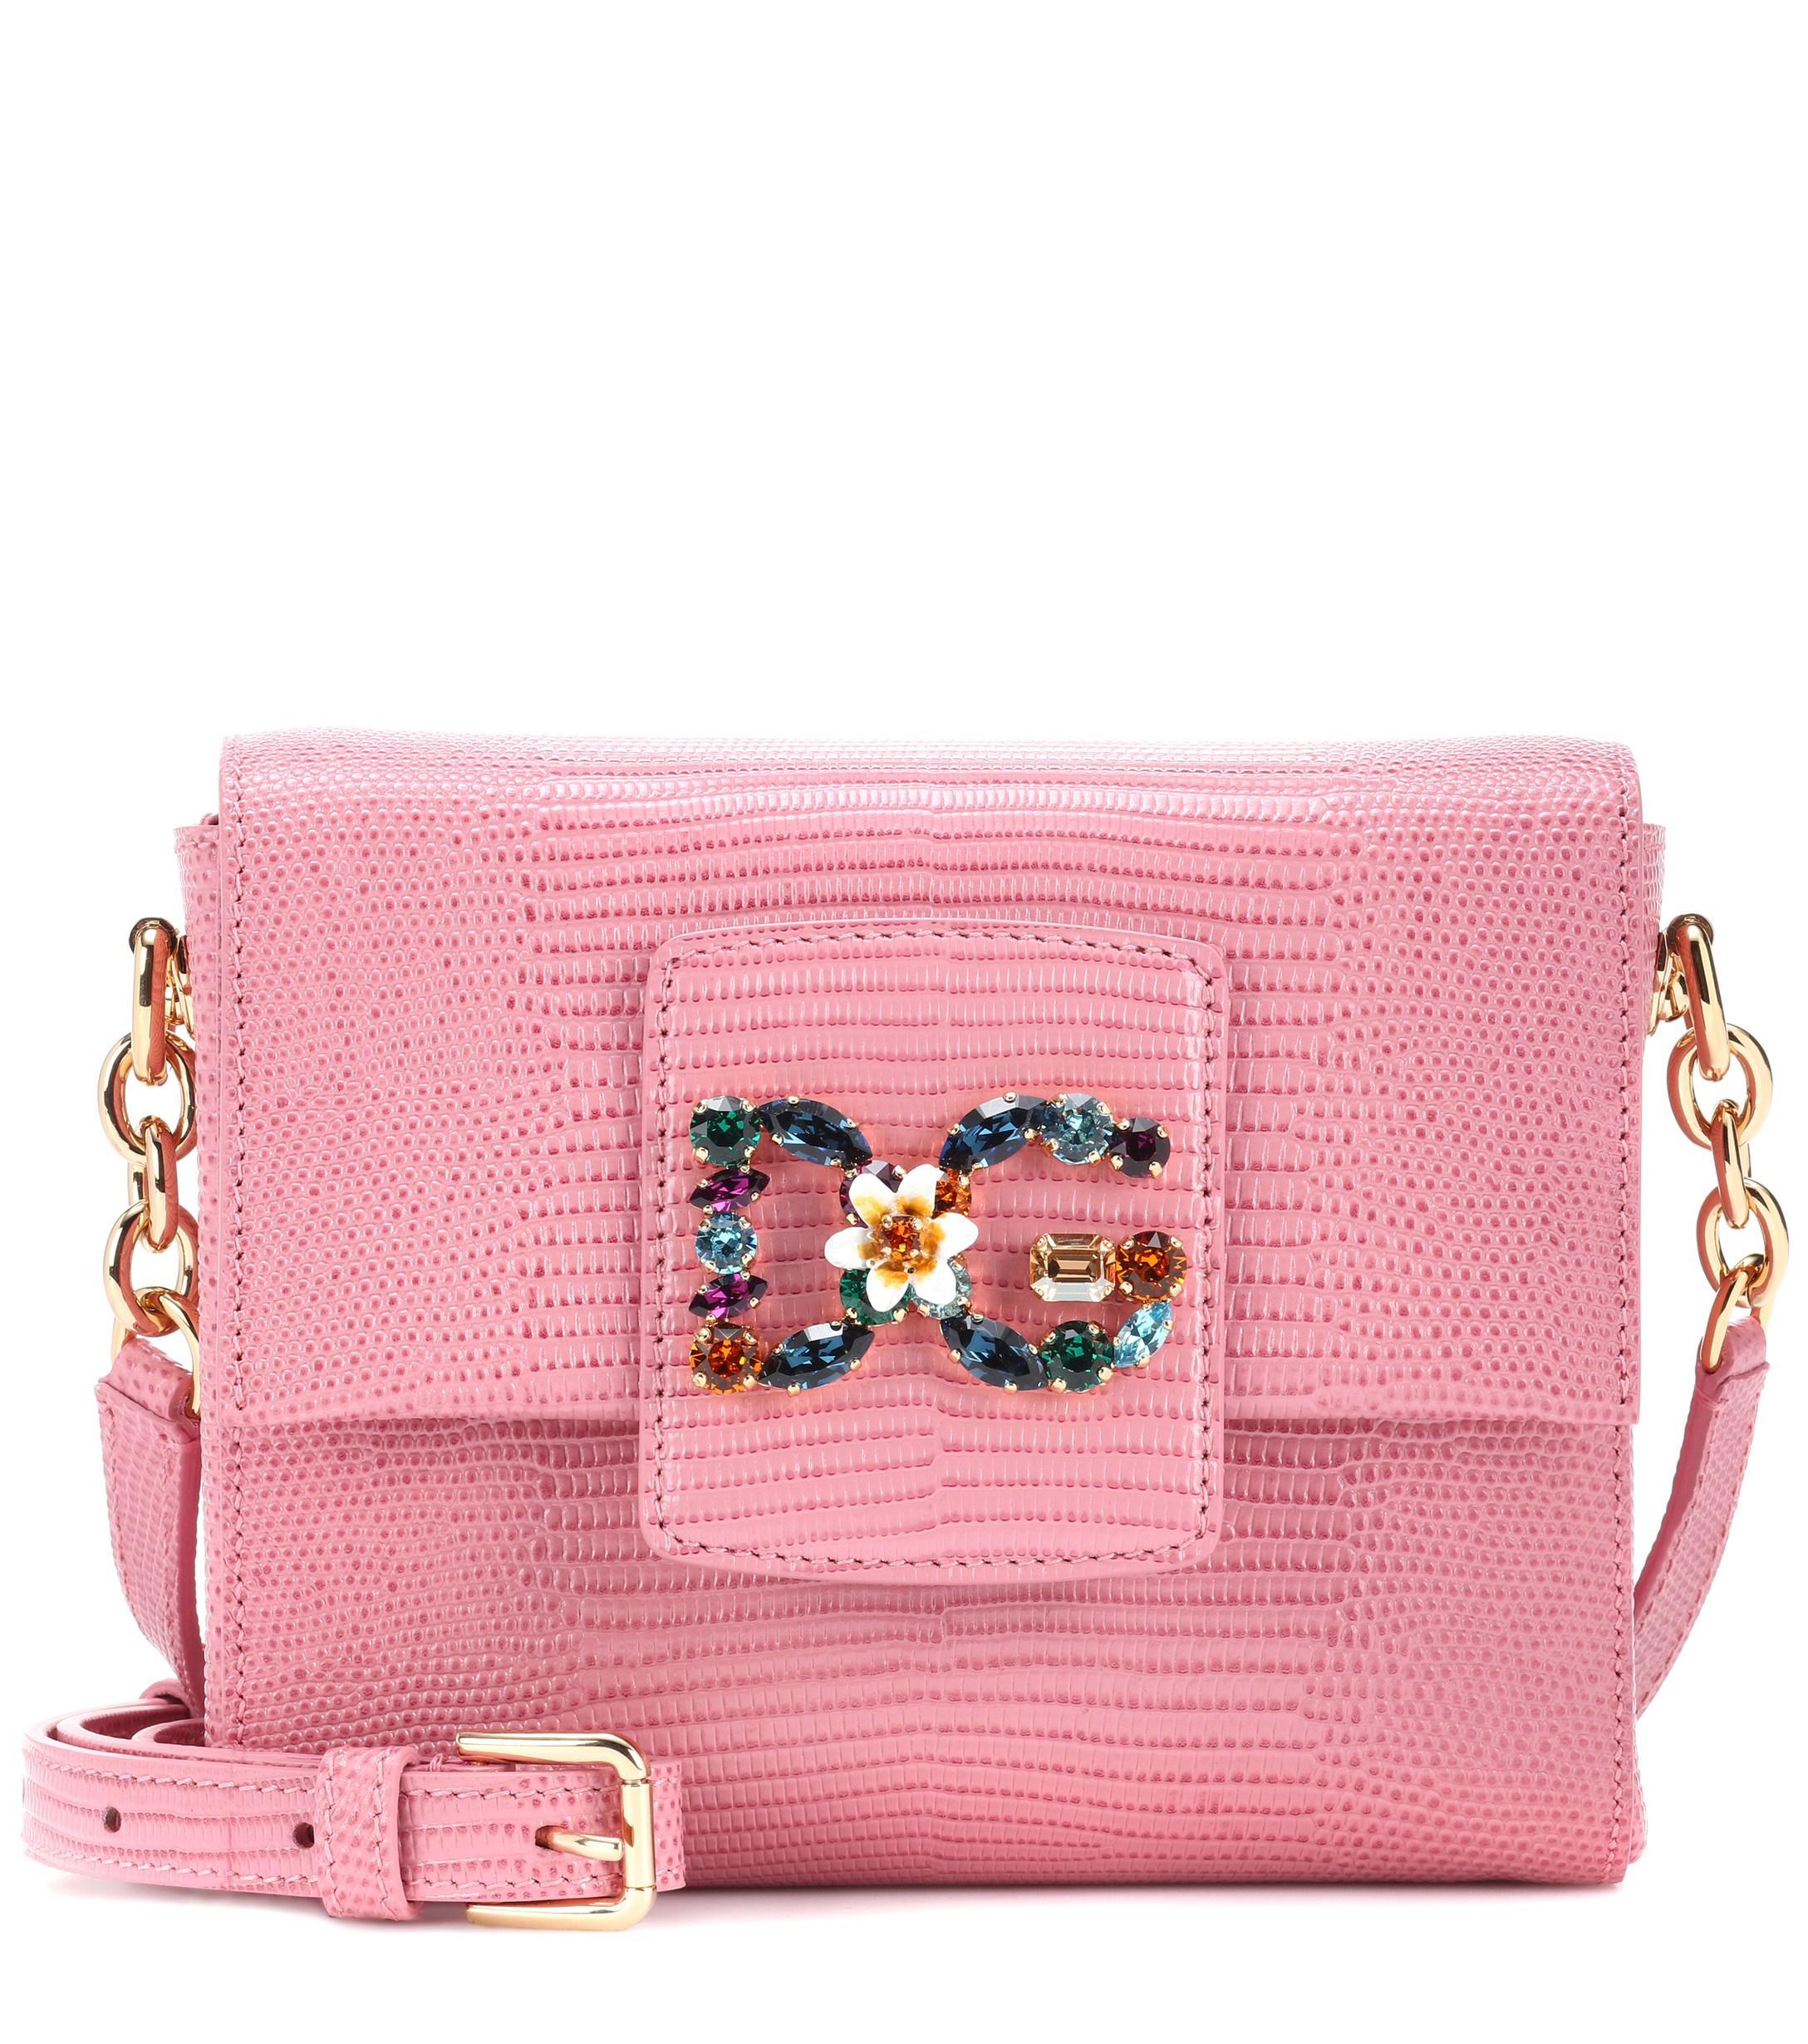 Lyst - Dolce   Gabbana Dg Millennials Mini Leather Shoulder Bag in Pink 01f1d5db418bc